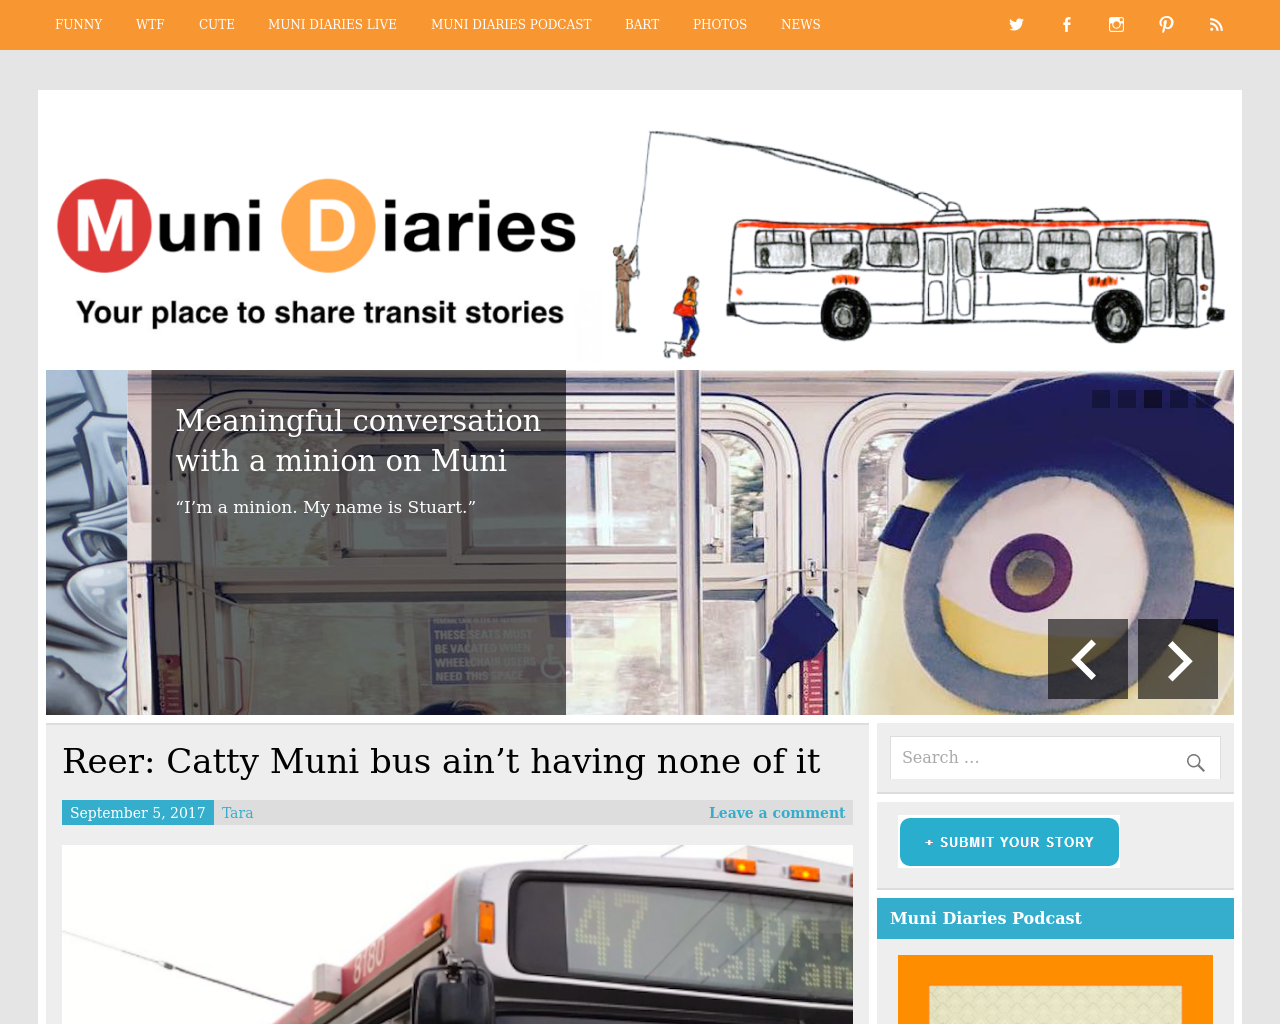 Muni-Diaries-Advertising-Reviews-Pricing